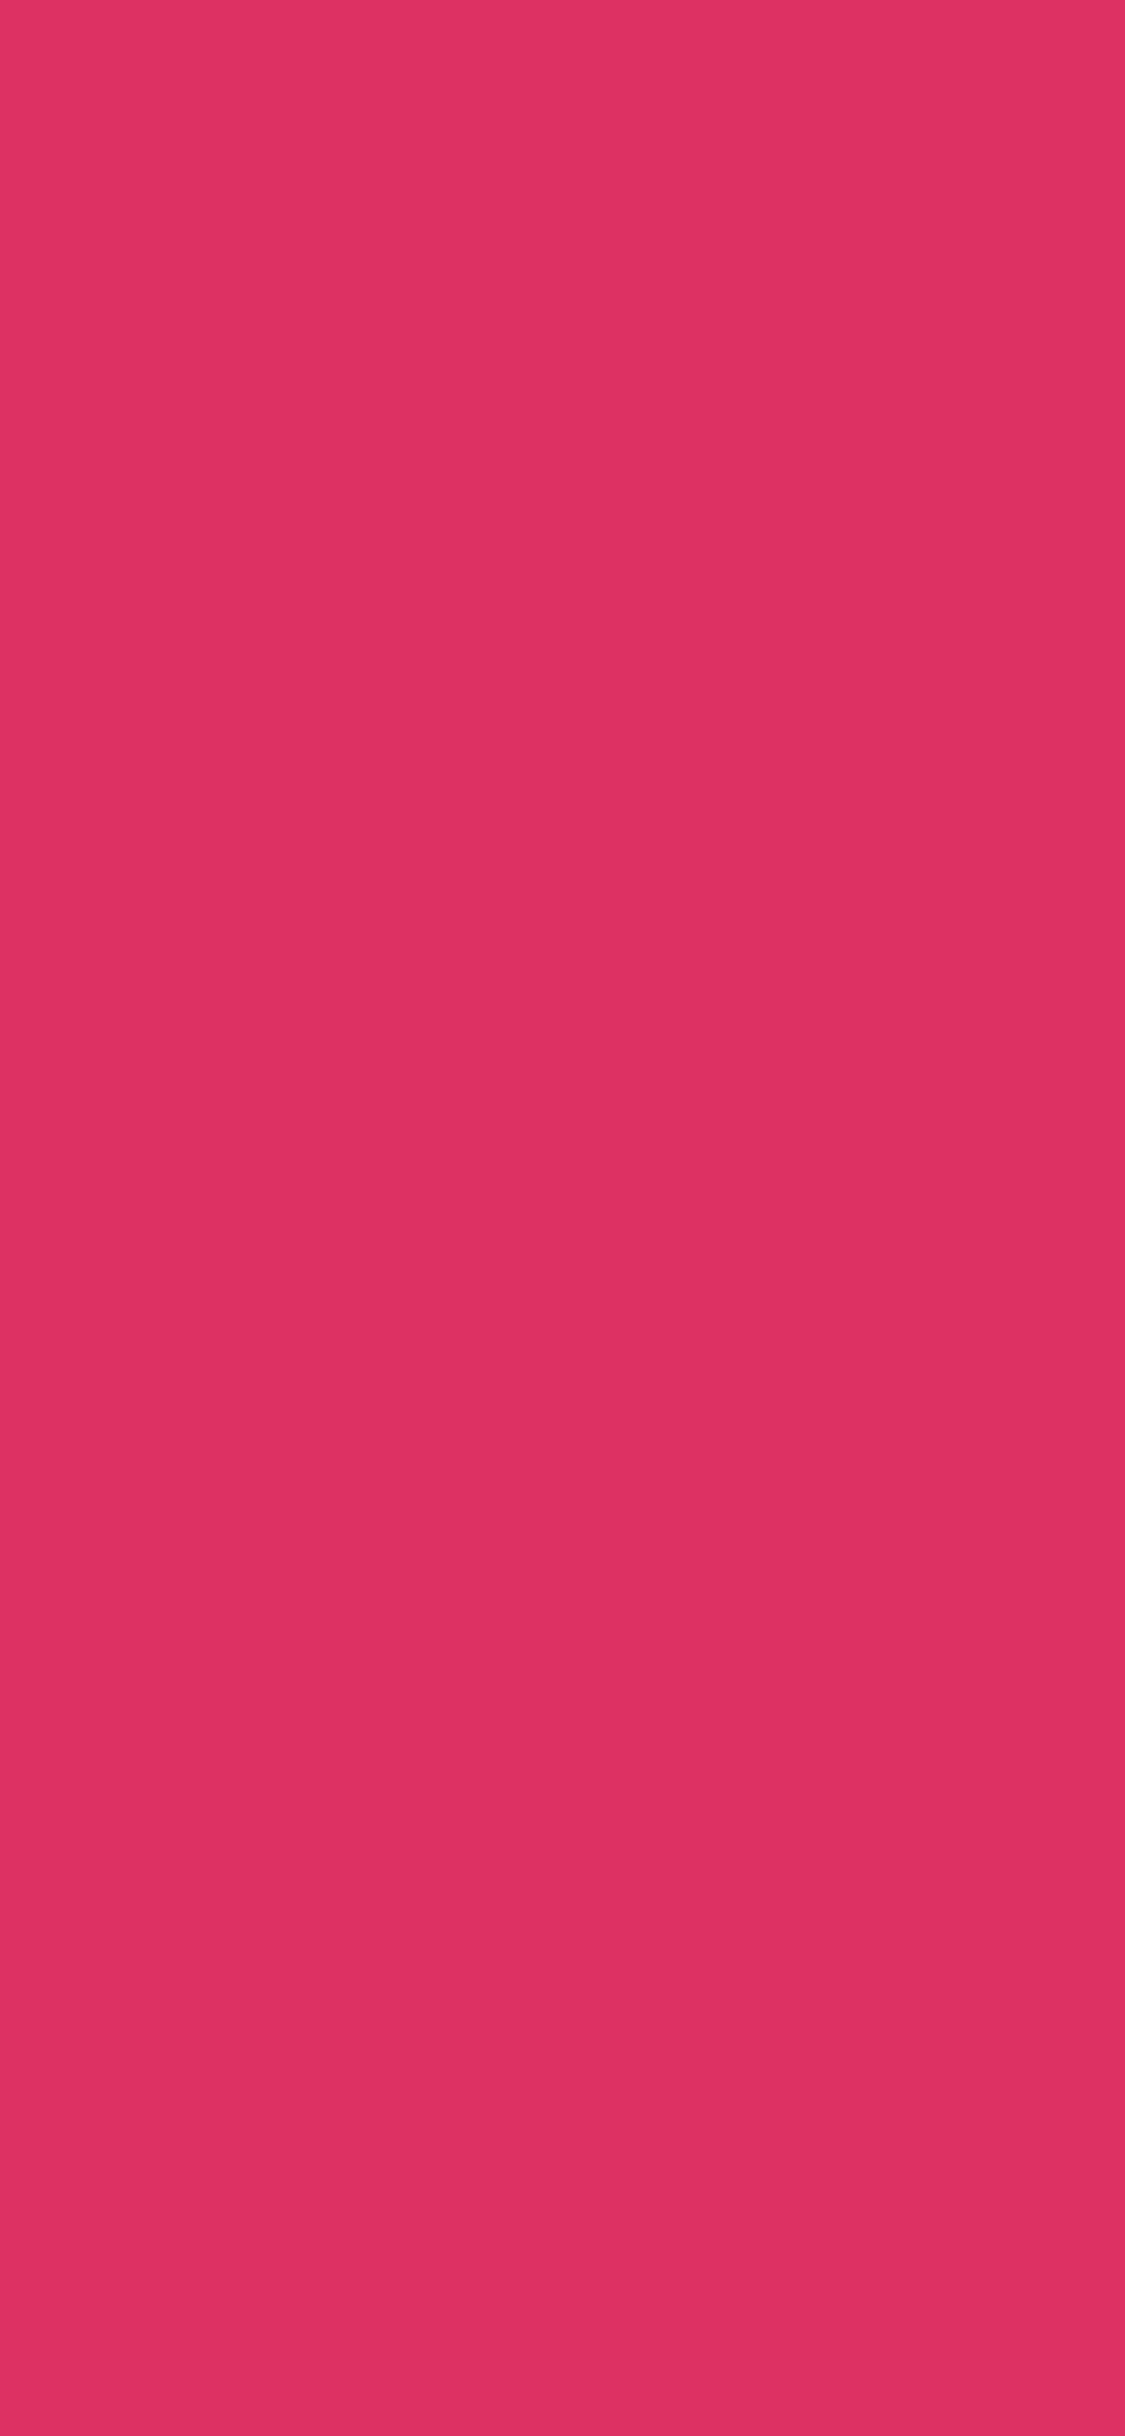 1125x2436 Cerise Solid Color Background